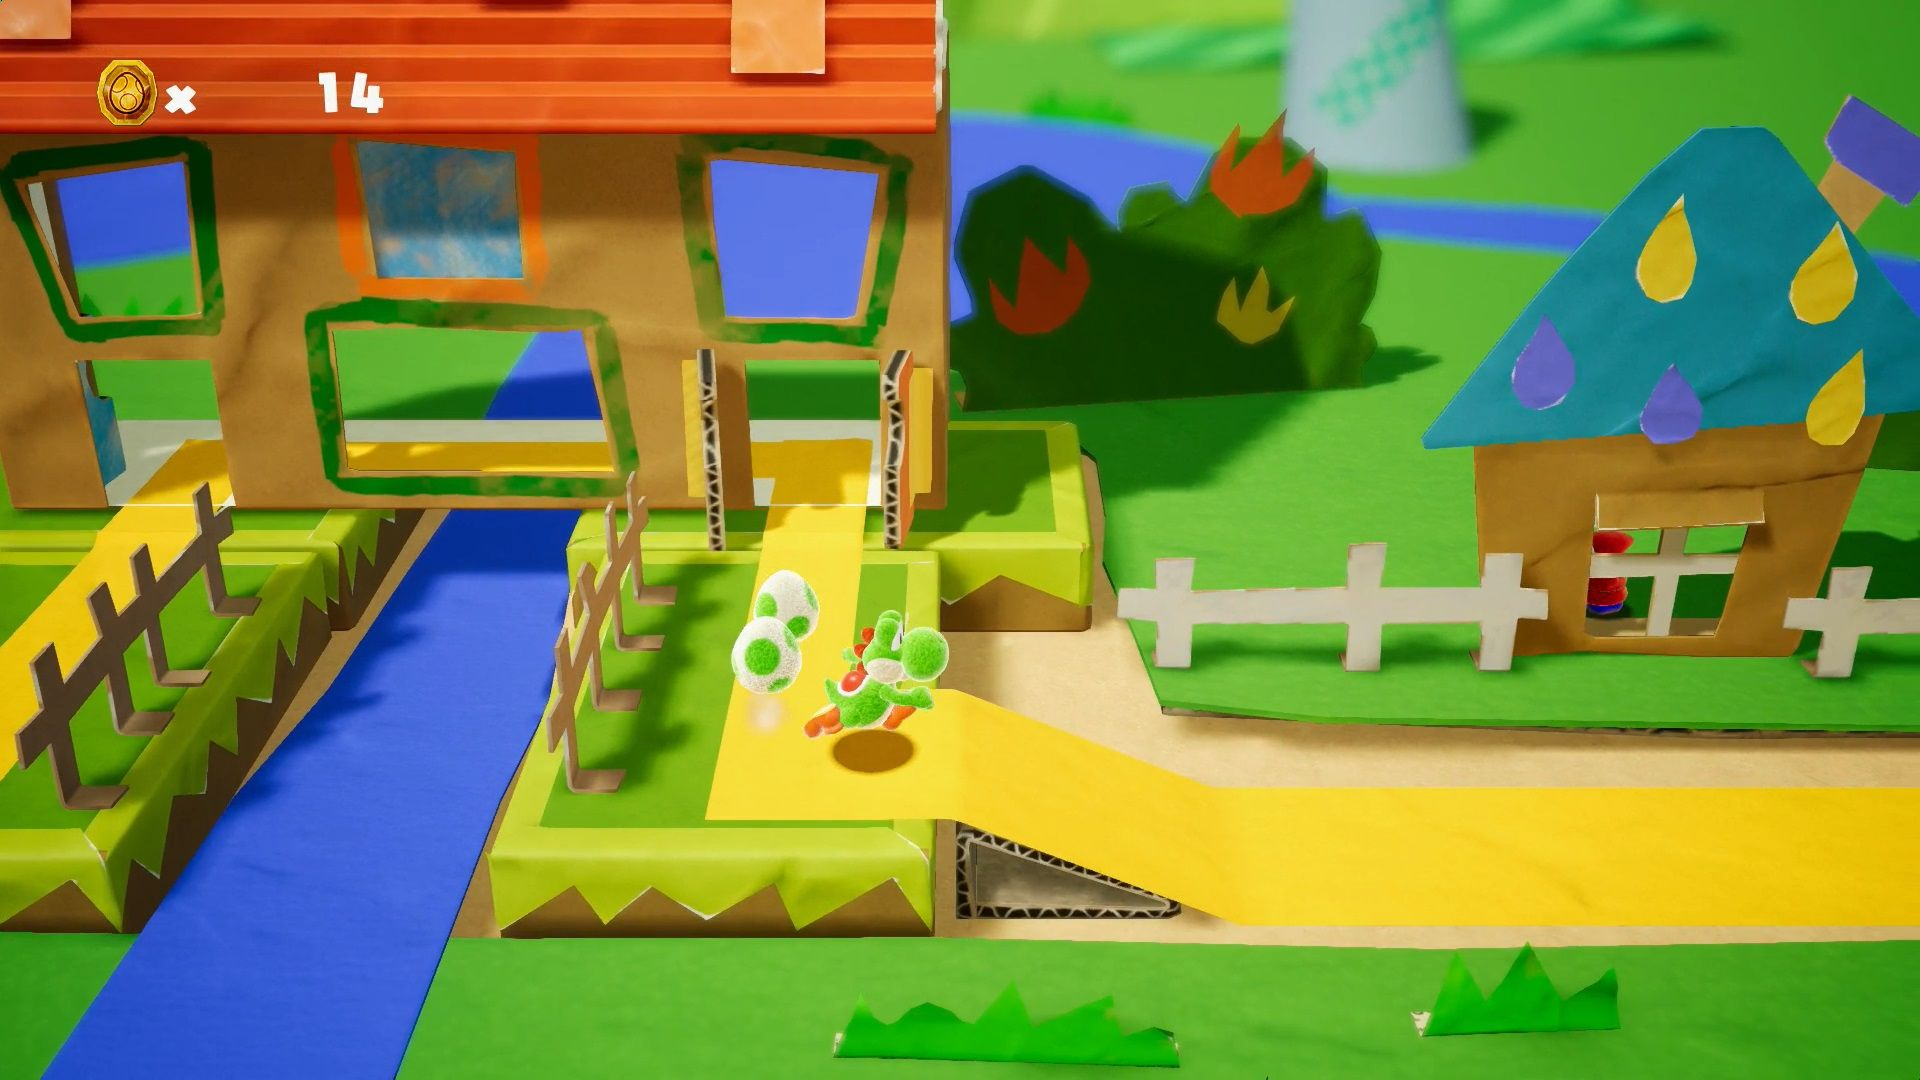 Nintendo Reveals Yoshi For Nintendo Switch